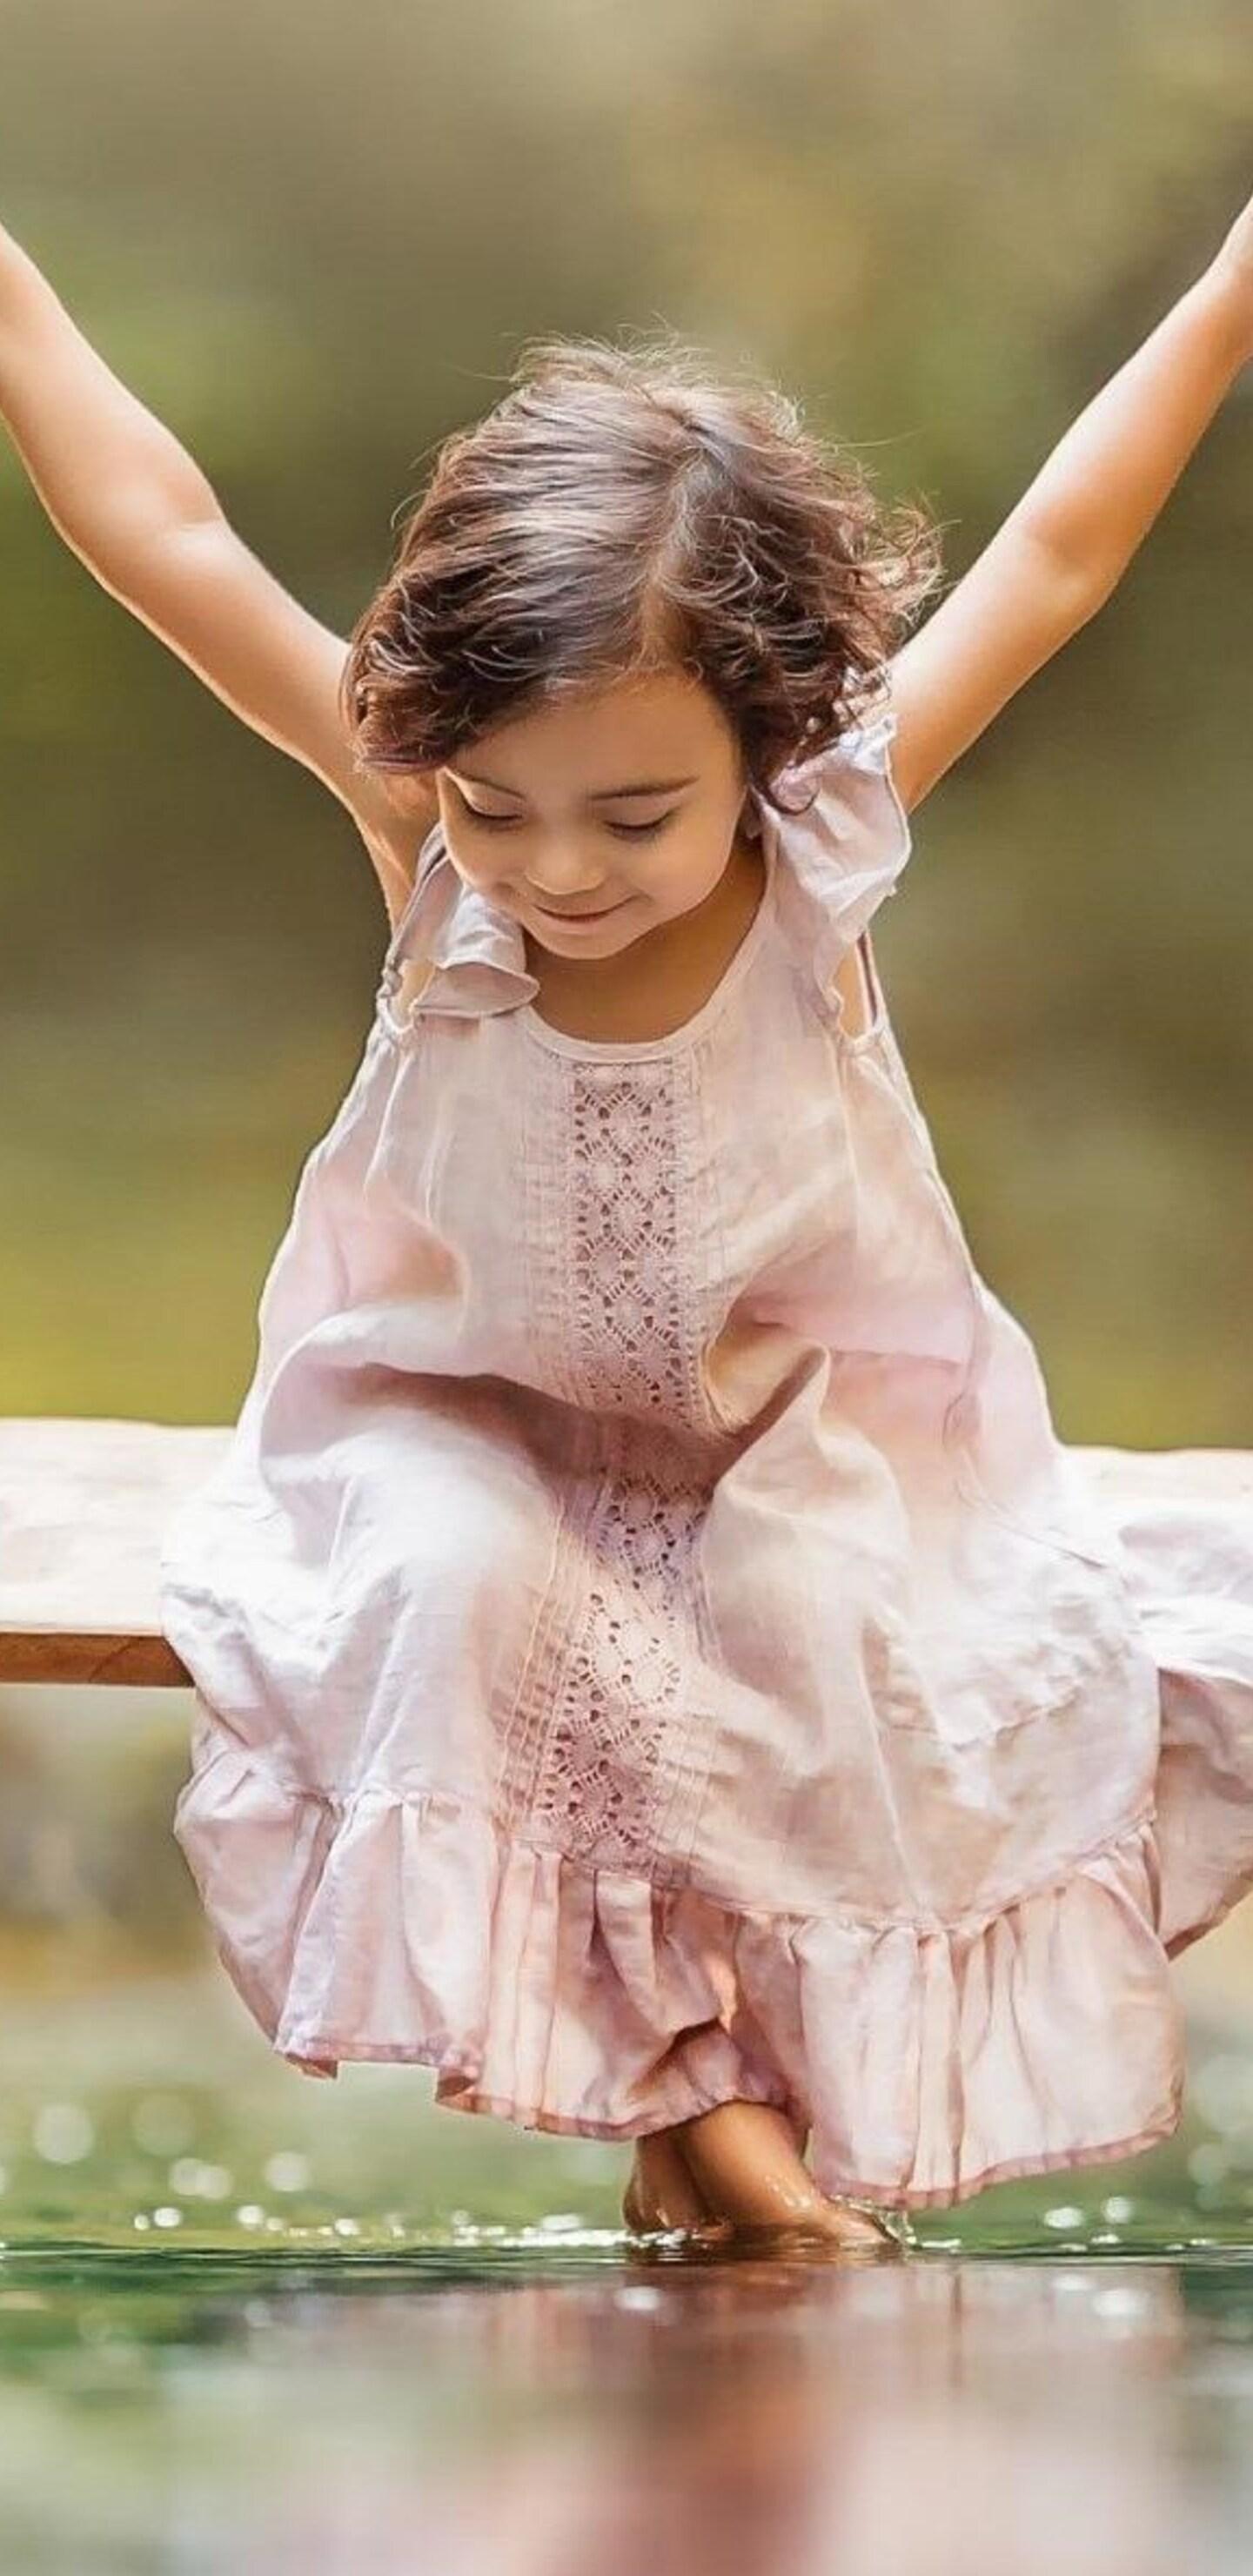 small-girl-taking-swing.jpg